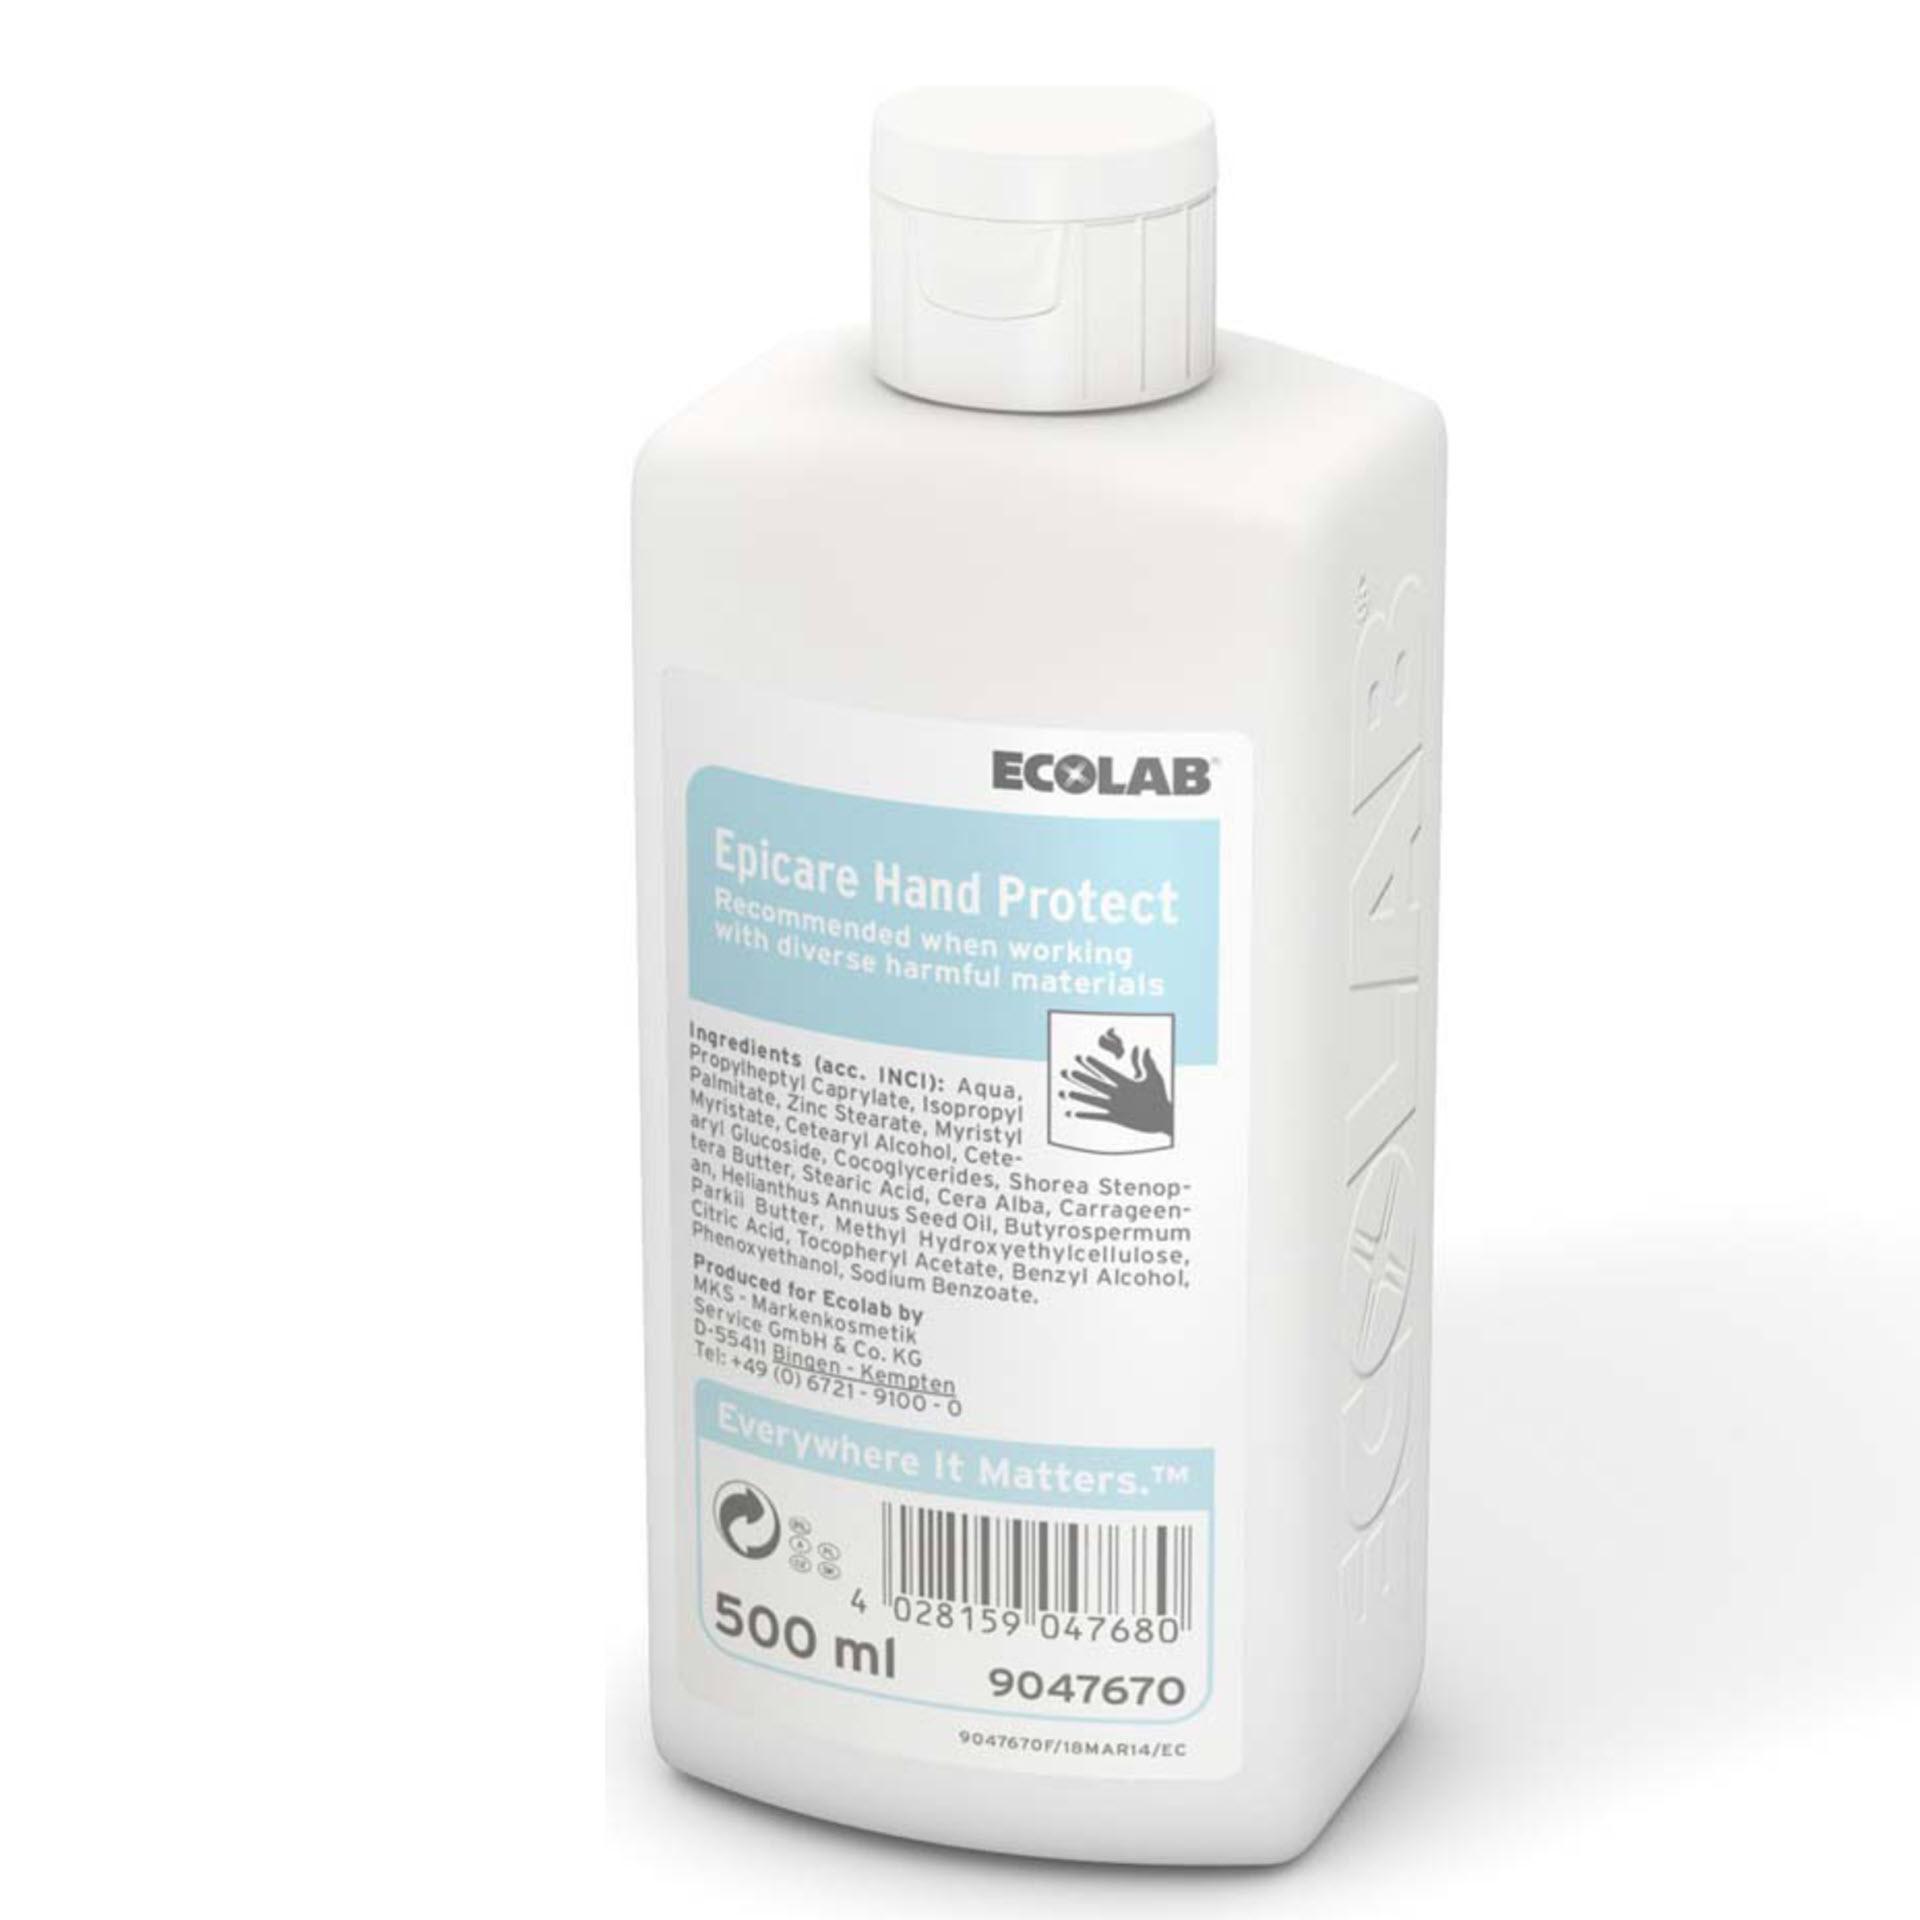 ECOLAB Epicare Hand Protect Hautschutzcreme - 500 ml Flasche